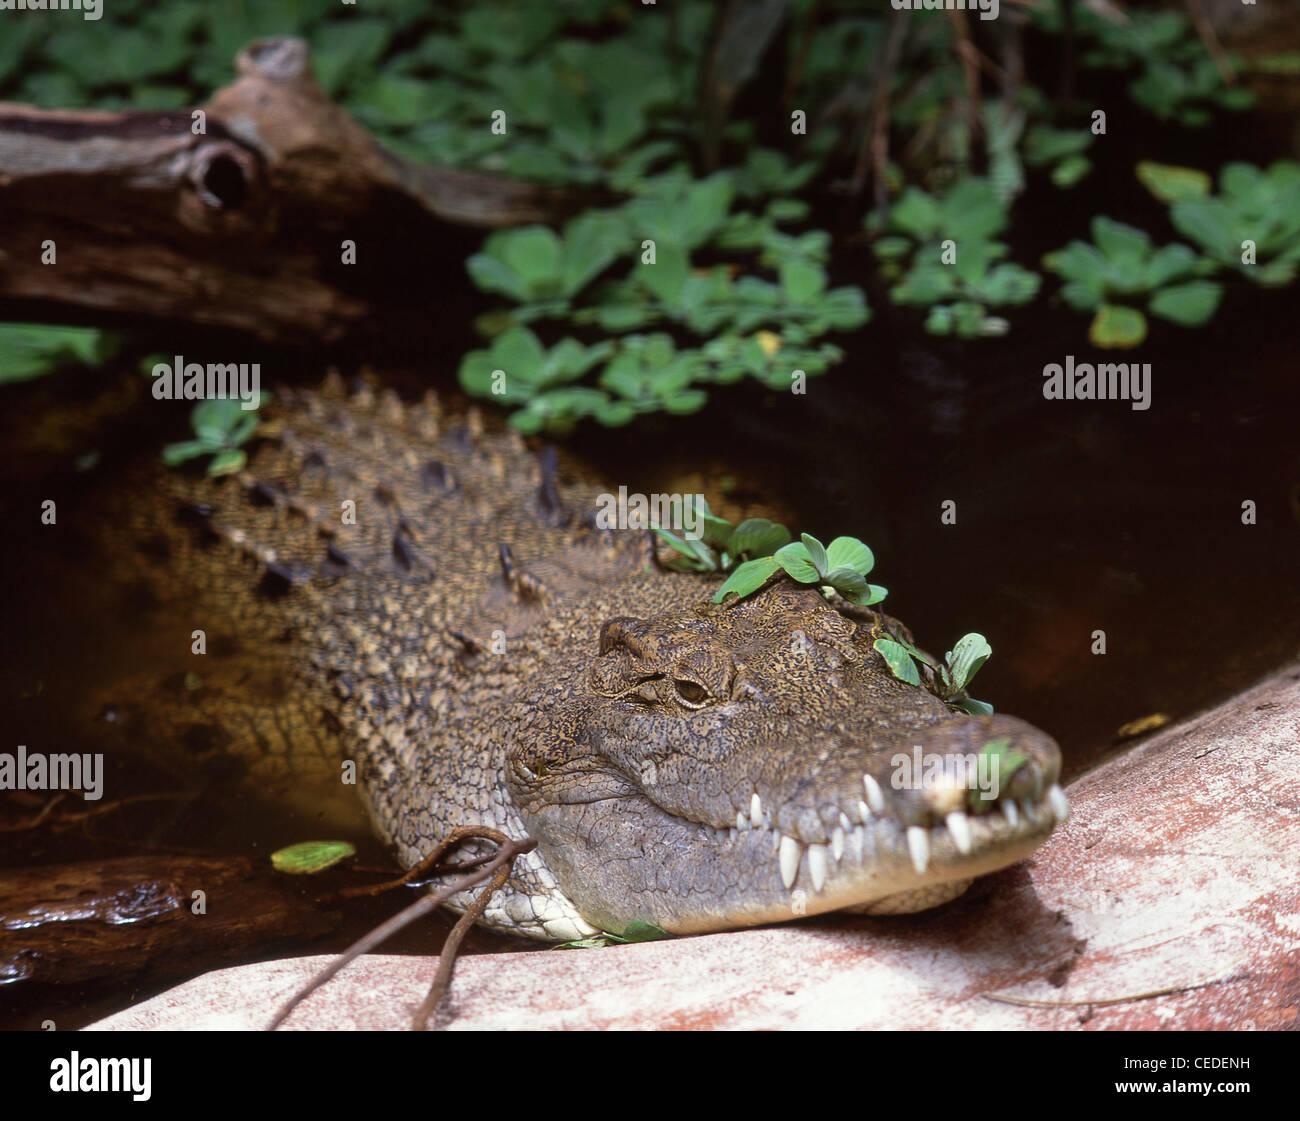 Krokodil ruhen, Green Island, Great Barrier Reef Marine Park, Queensland, Australien Stockfoto